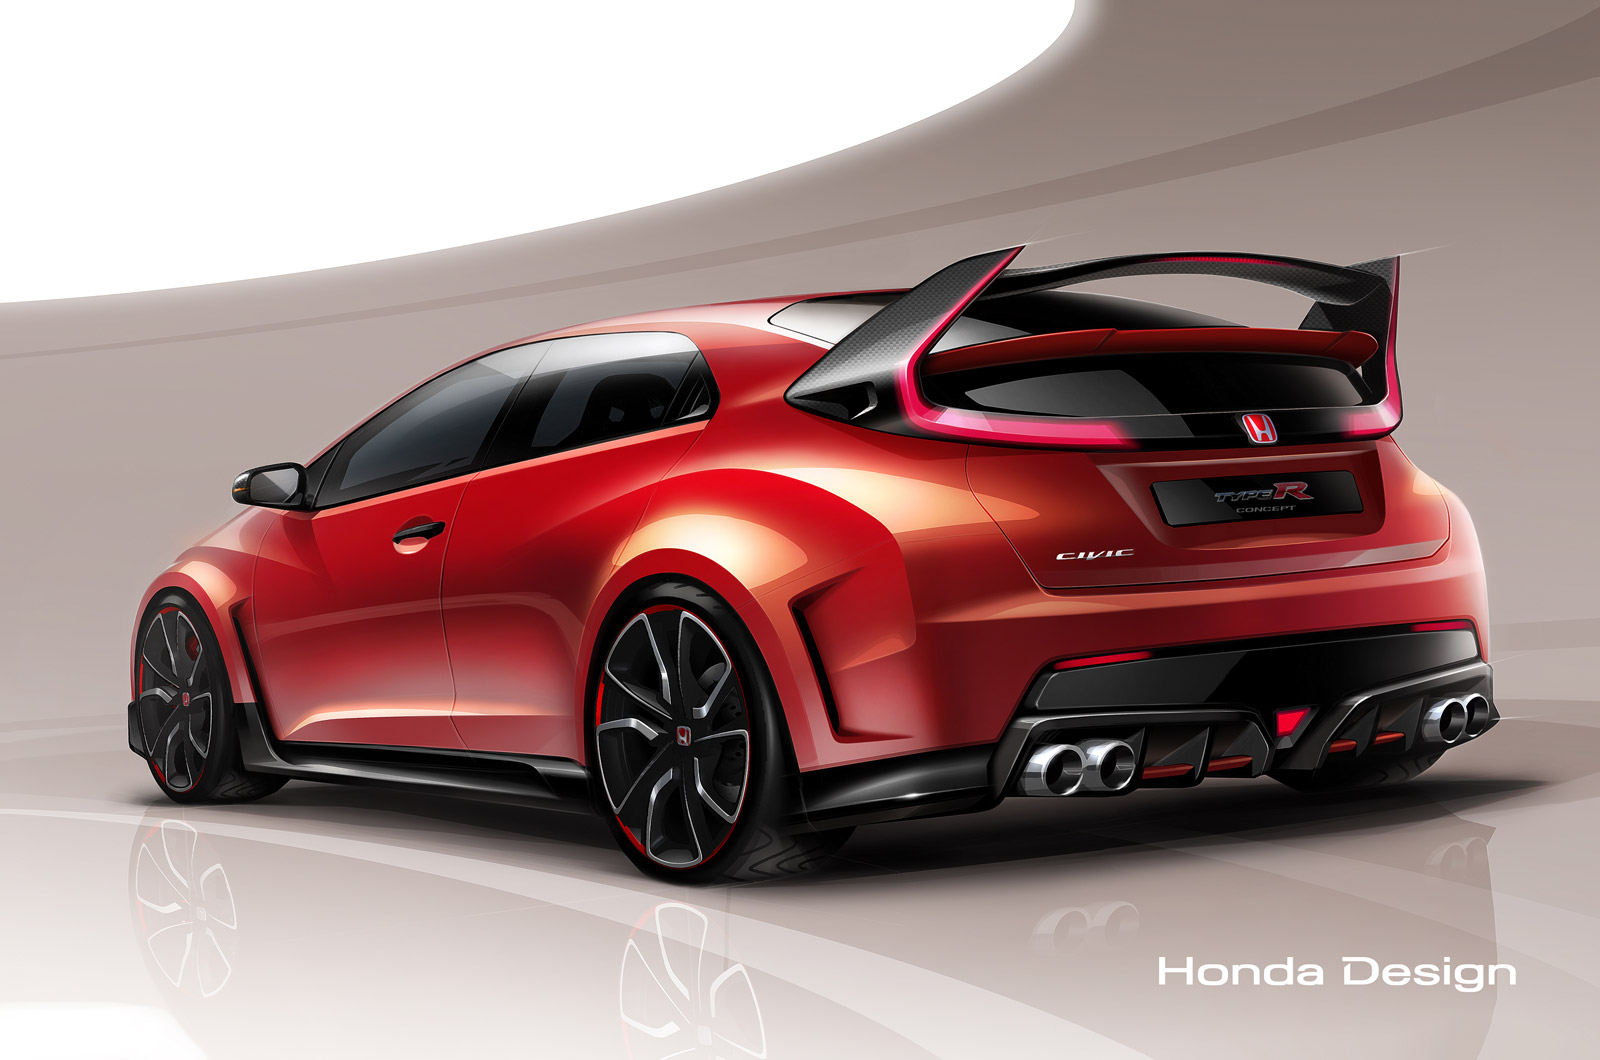 2015 Honda Civic Type R Wallpaper HD 4074   Grivucom 1600x1060